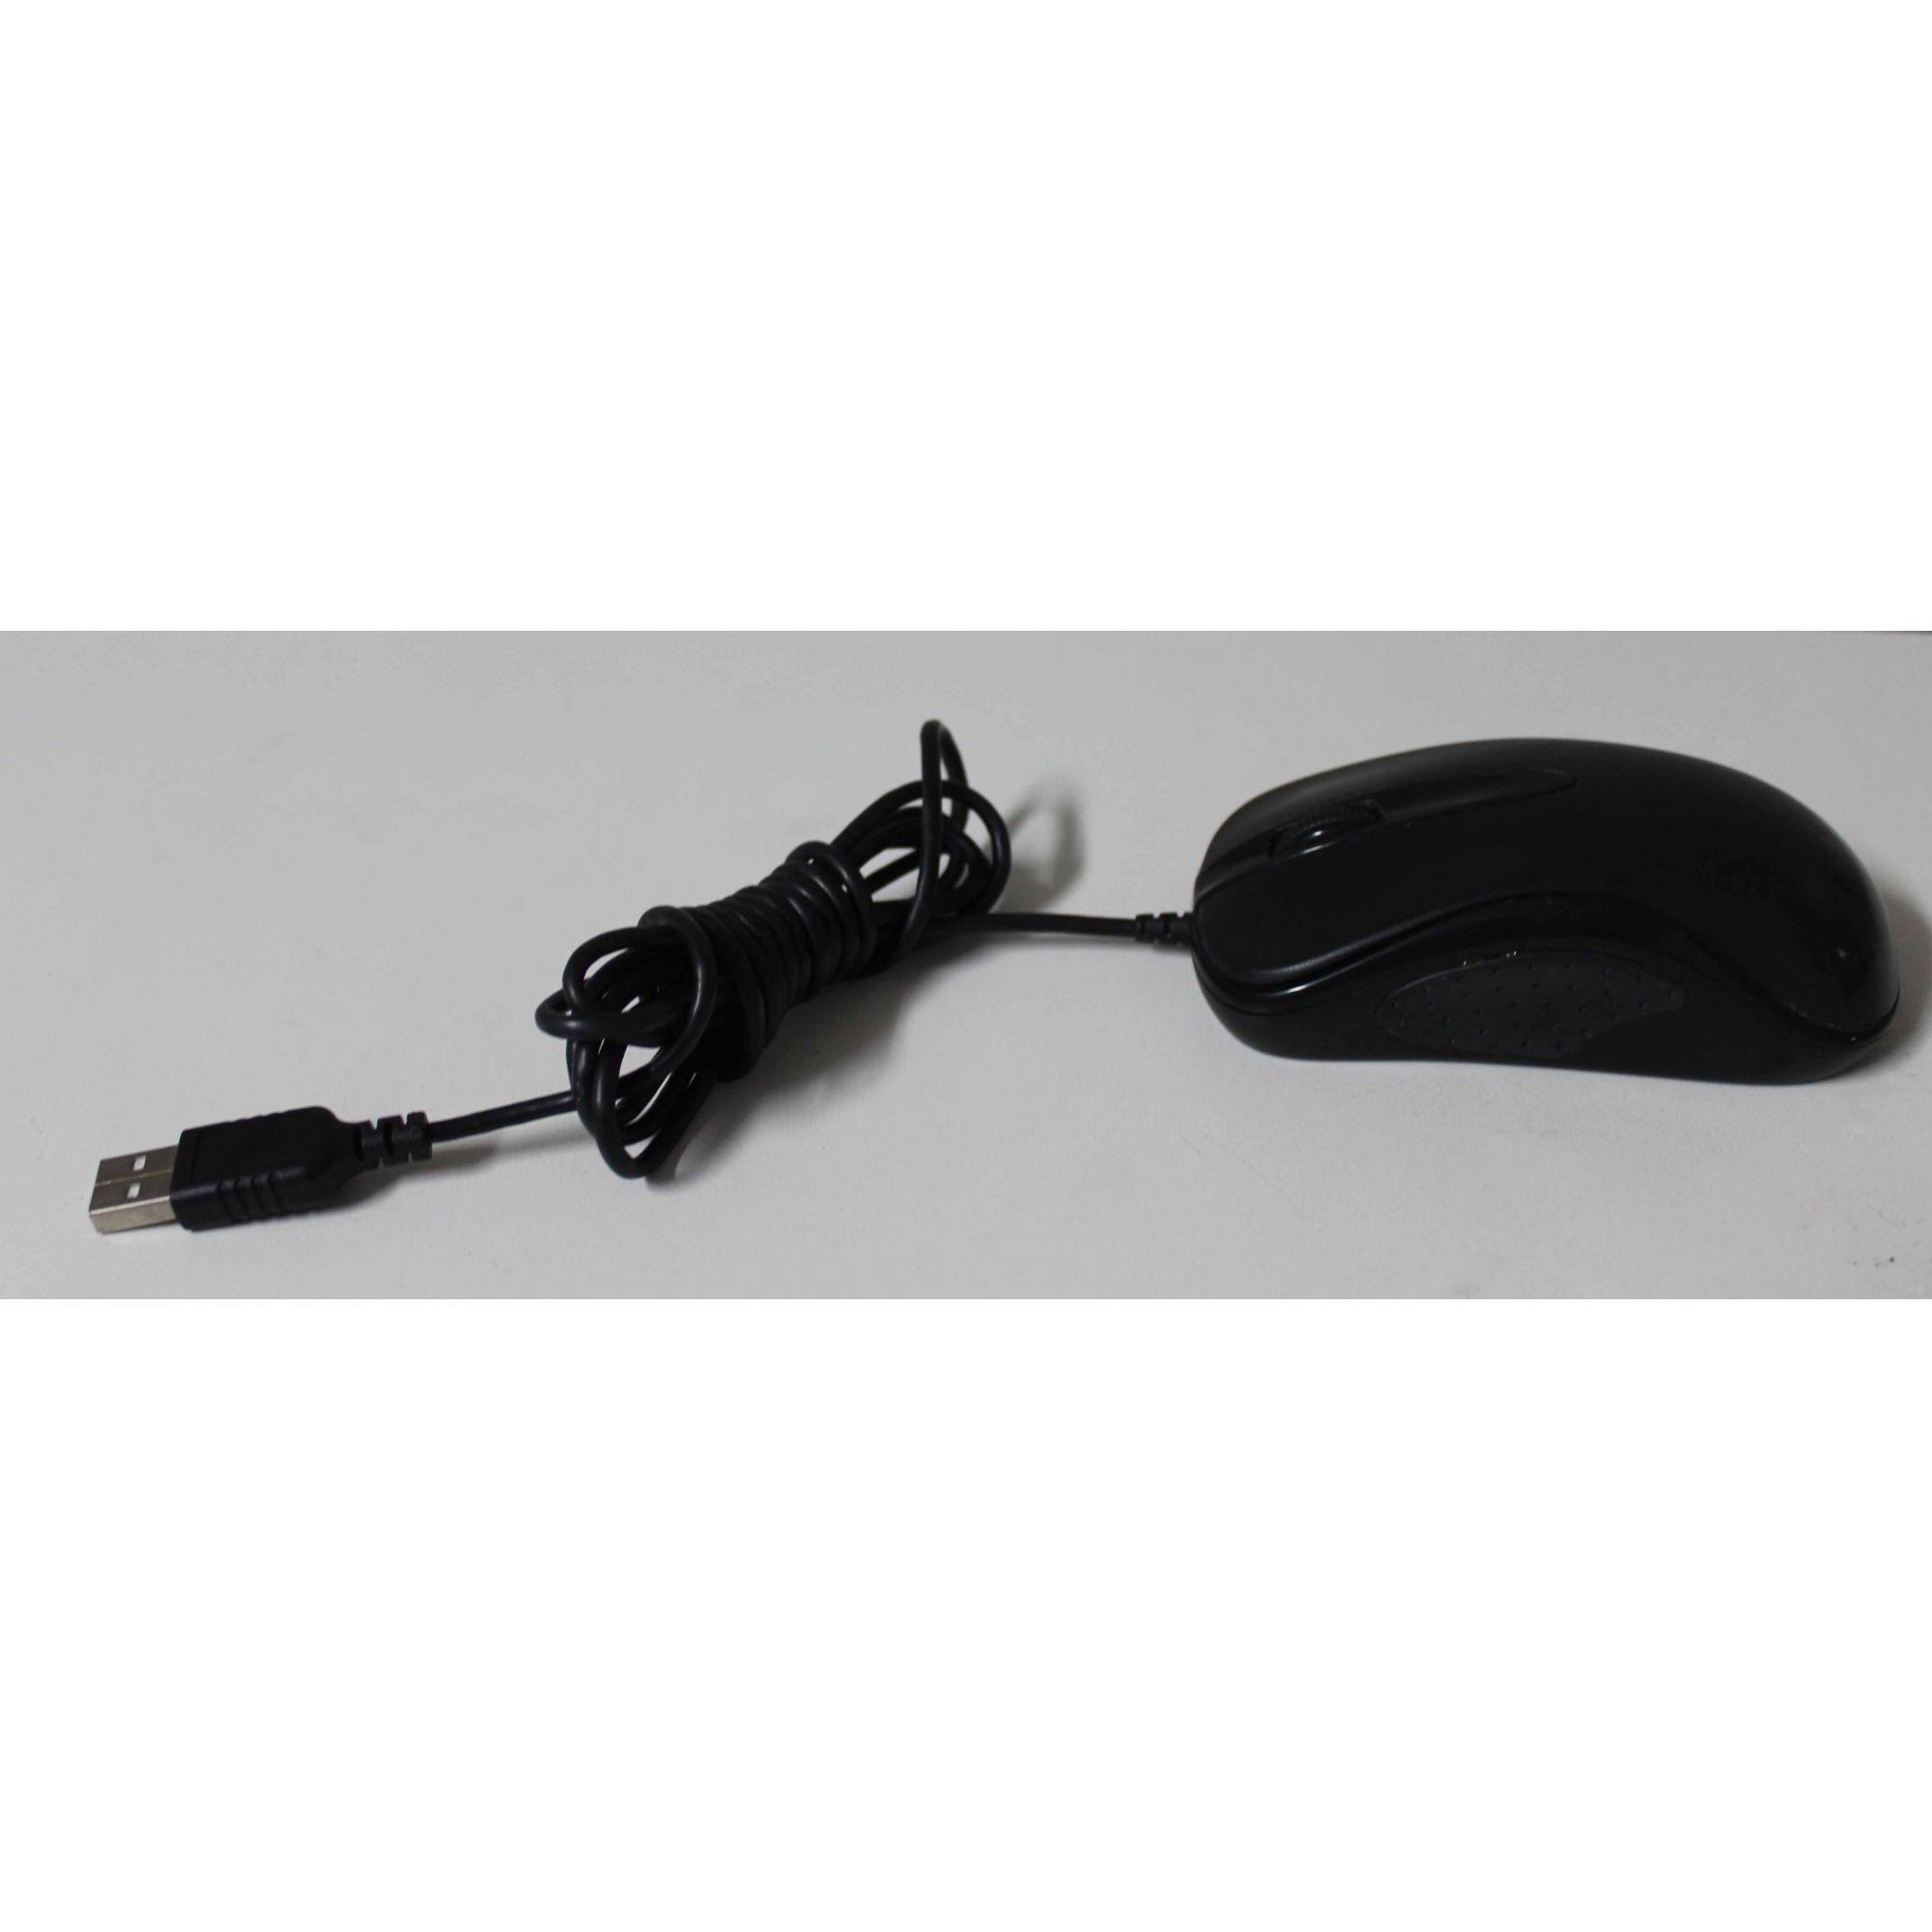 Mouse Mtek USB MS209U - Preto